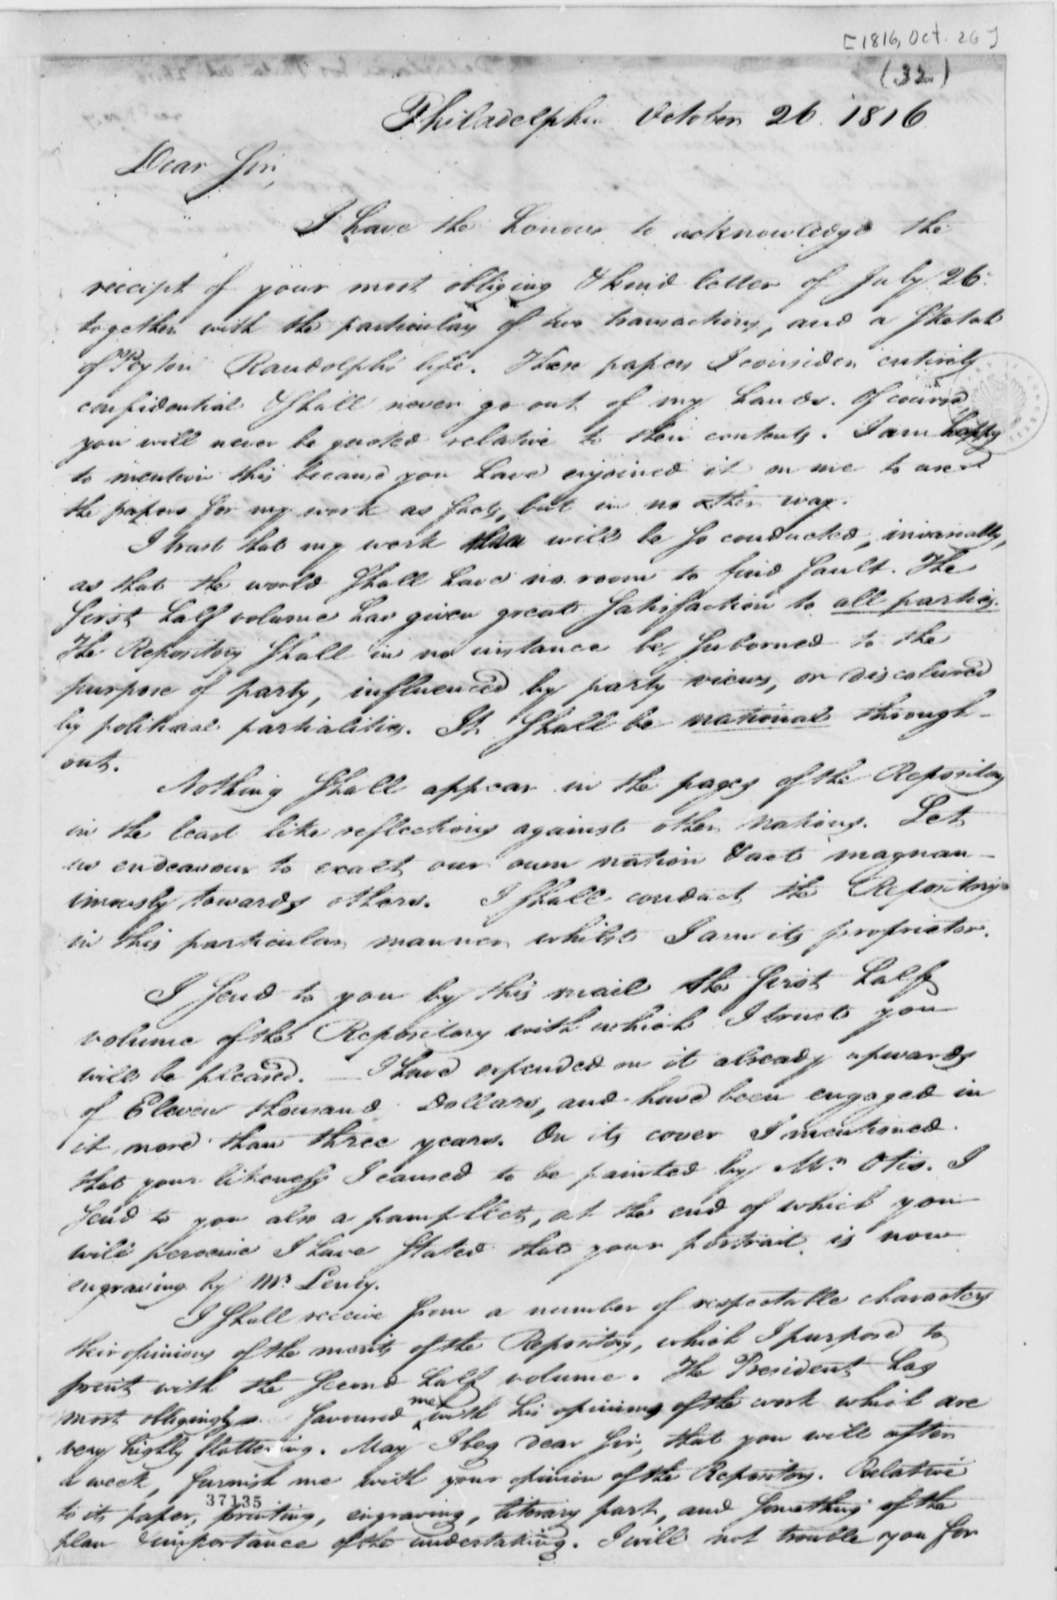 Joseph Delaplaine to Thomas Jefferson, October 26, 1816